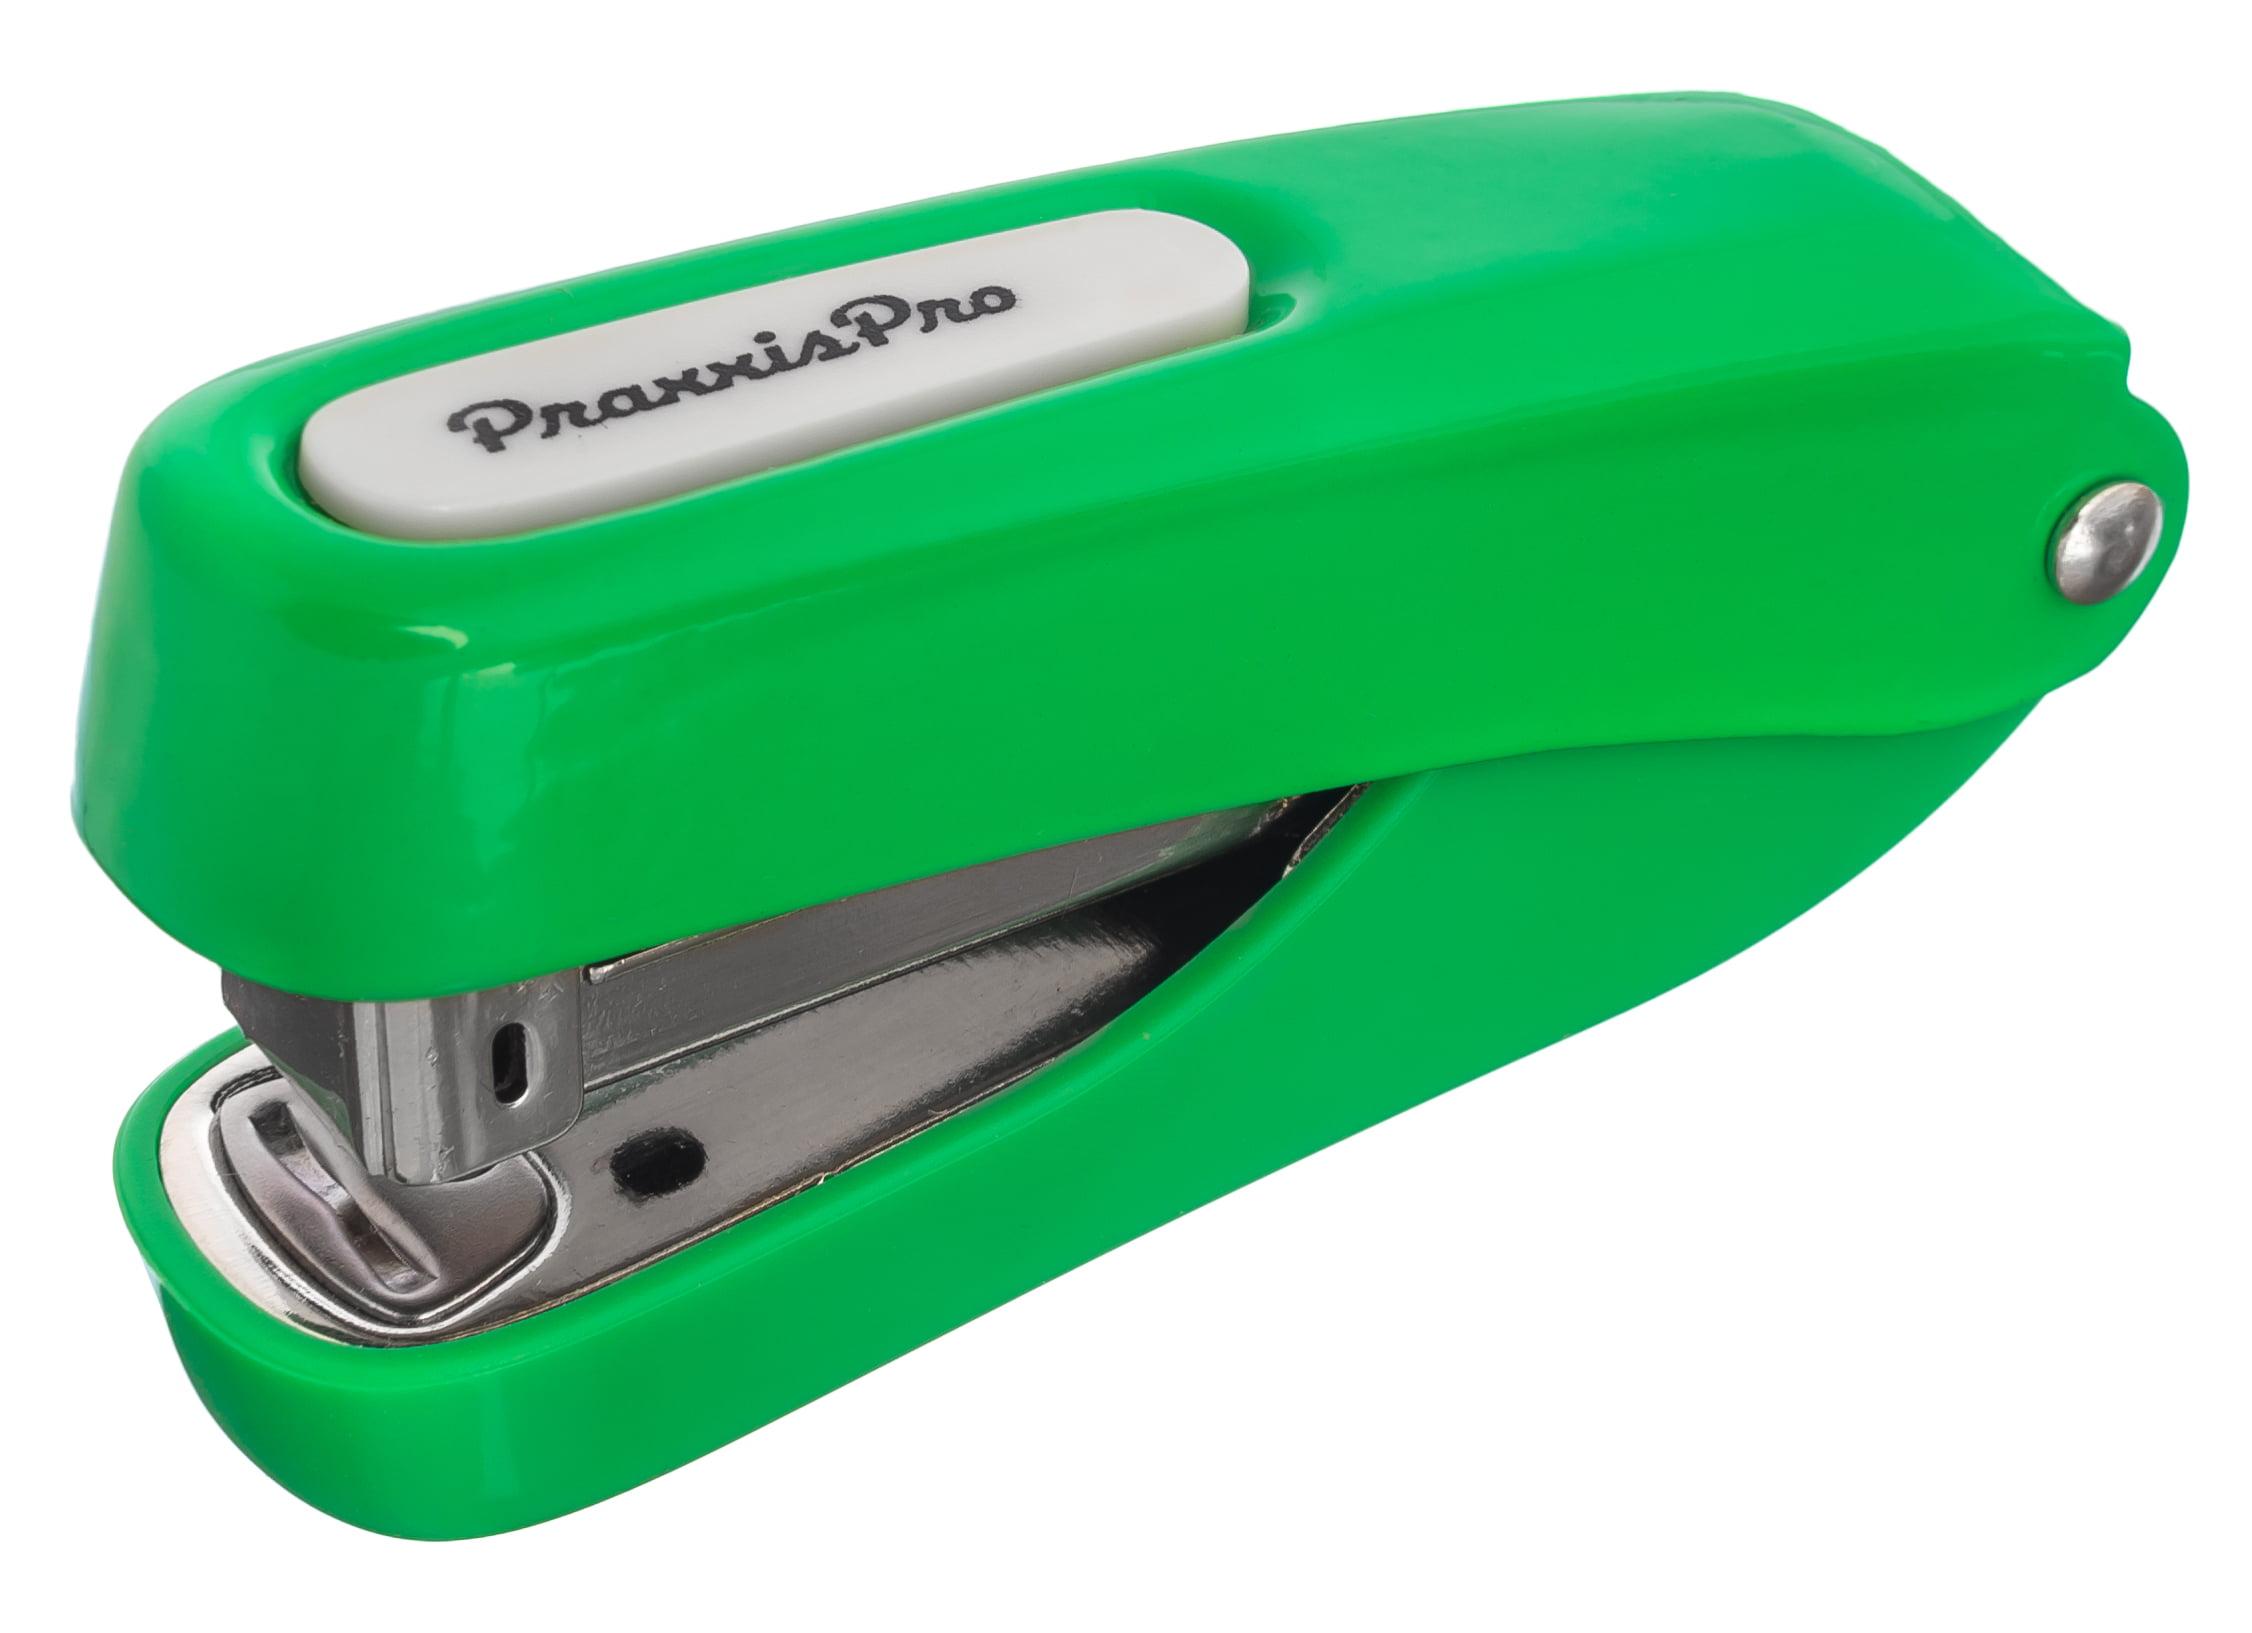 Adjustable 10 Sheet Punch Capacity Precision Pro Swingline Desktop Hole Punch Hole Puncher Black//Silver 2-3 Holes 74037